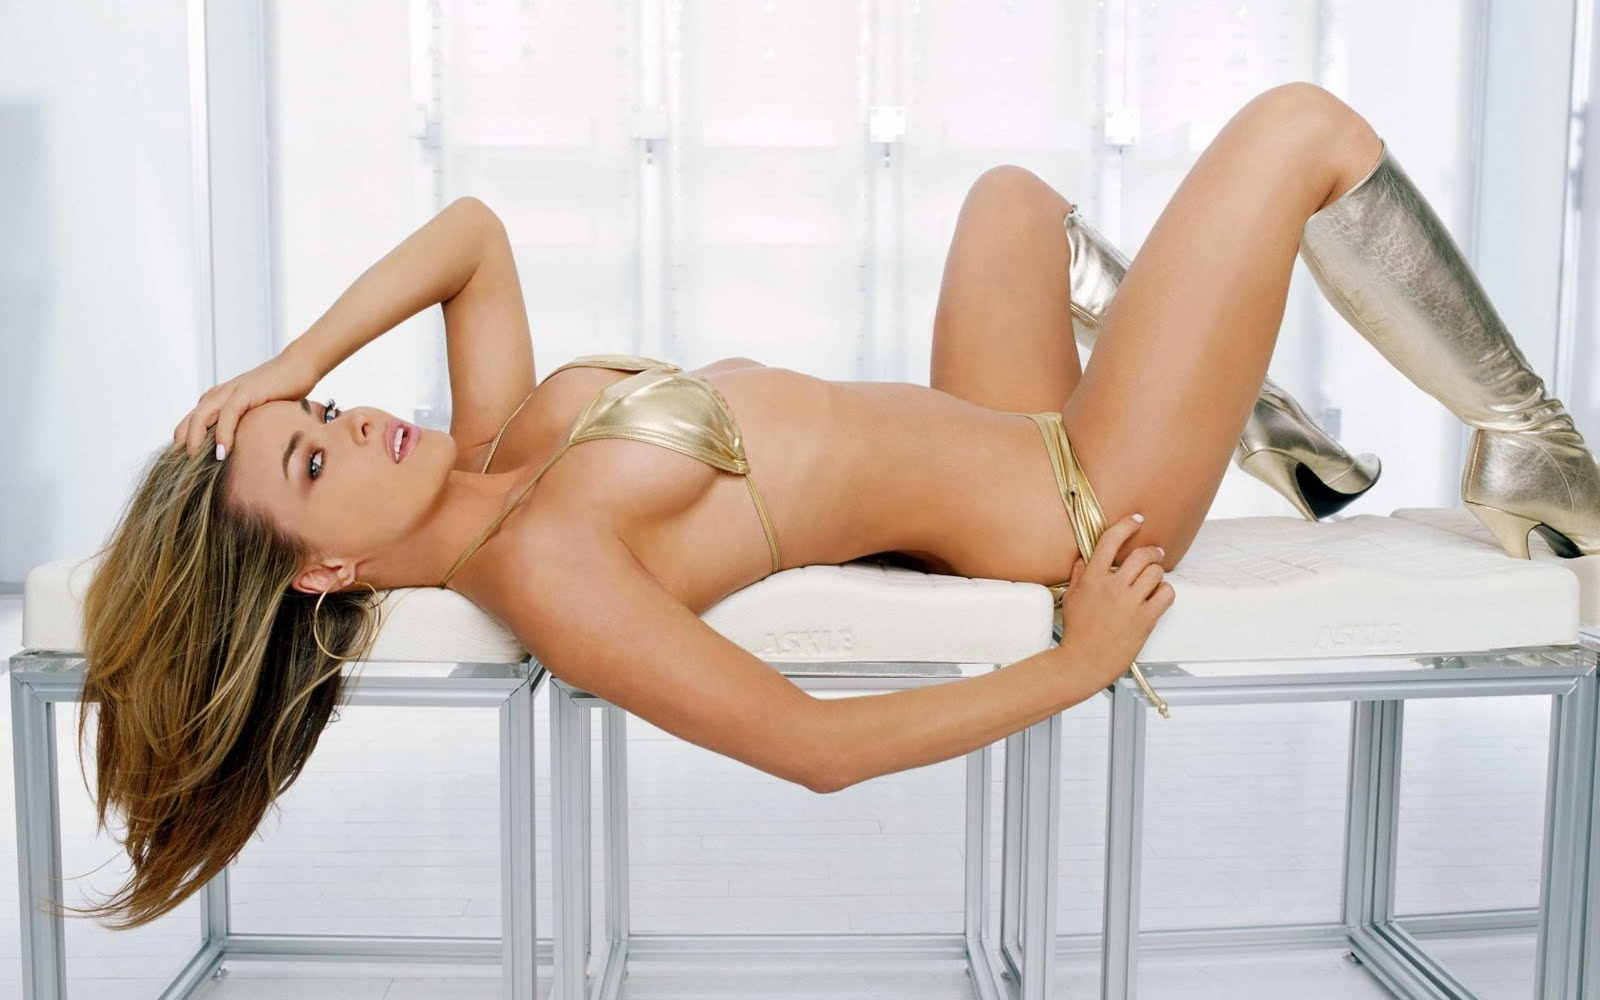 hot celebrity 2012